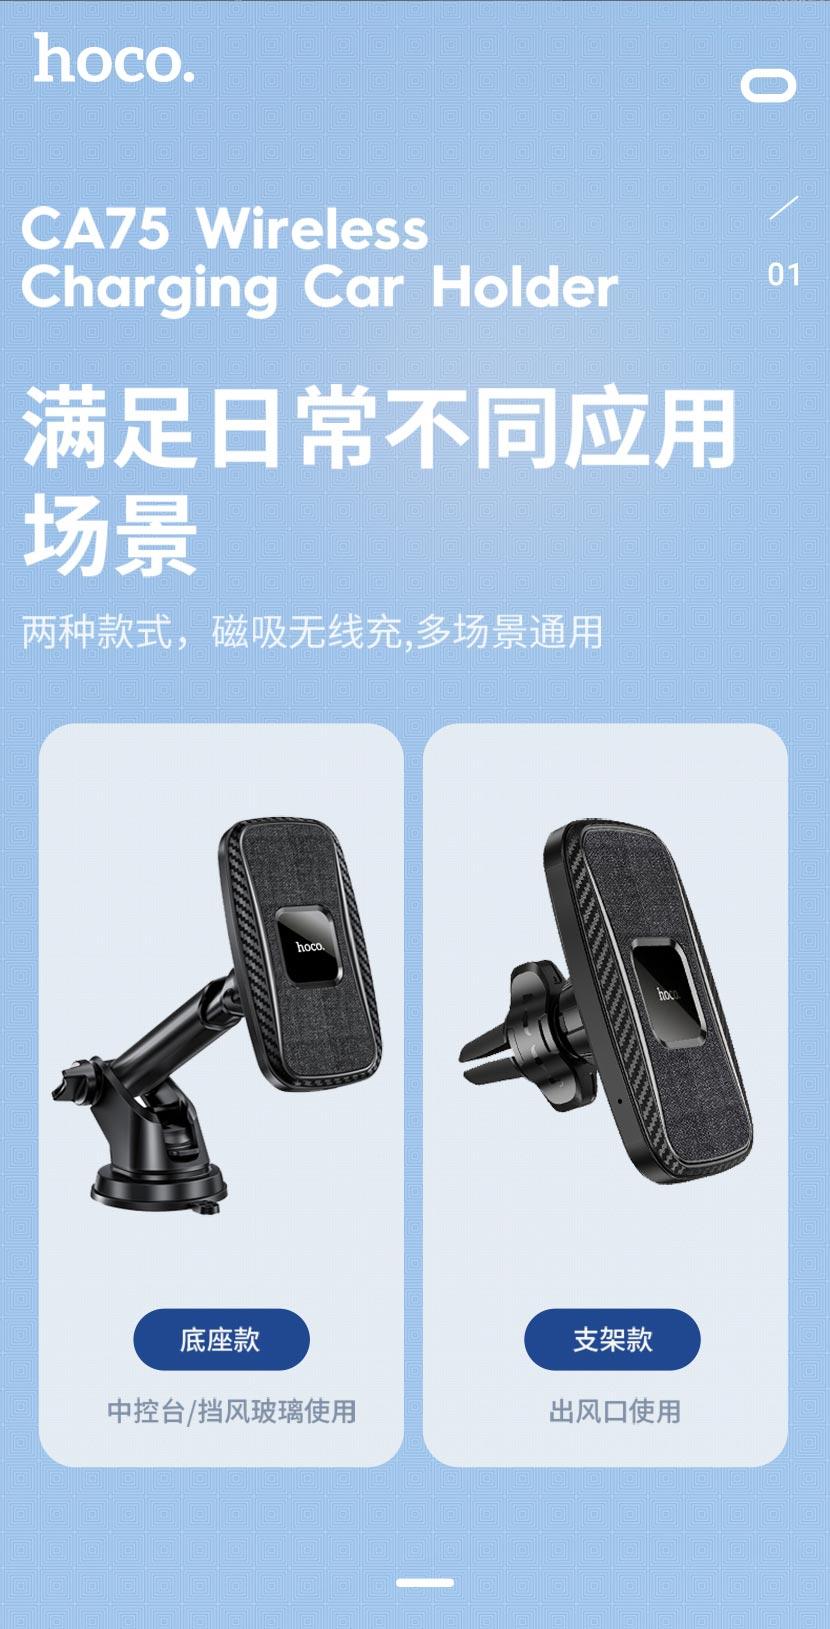 hoco news ca75 magnetic wireless charging car holder universal cn